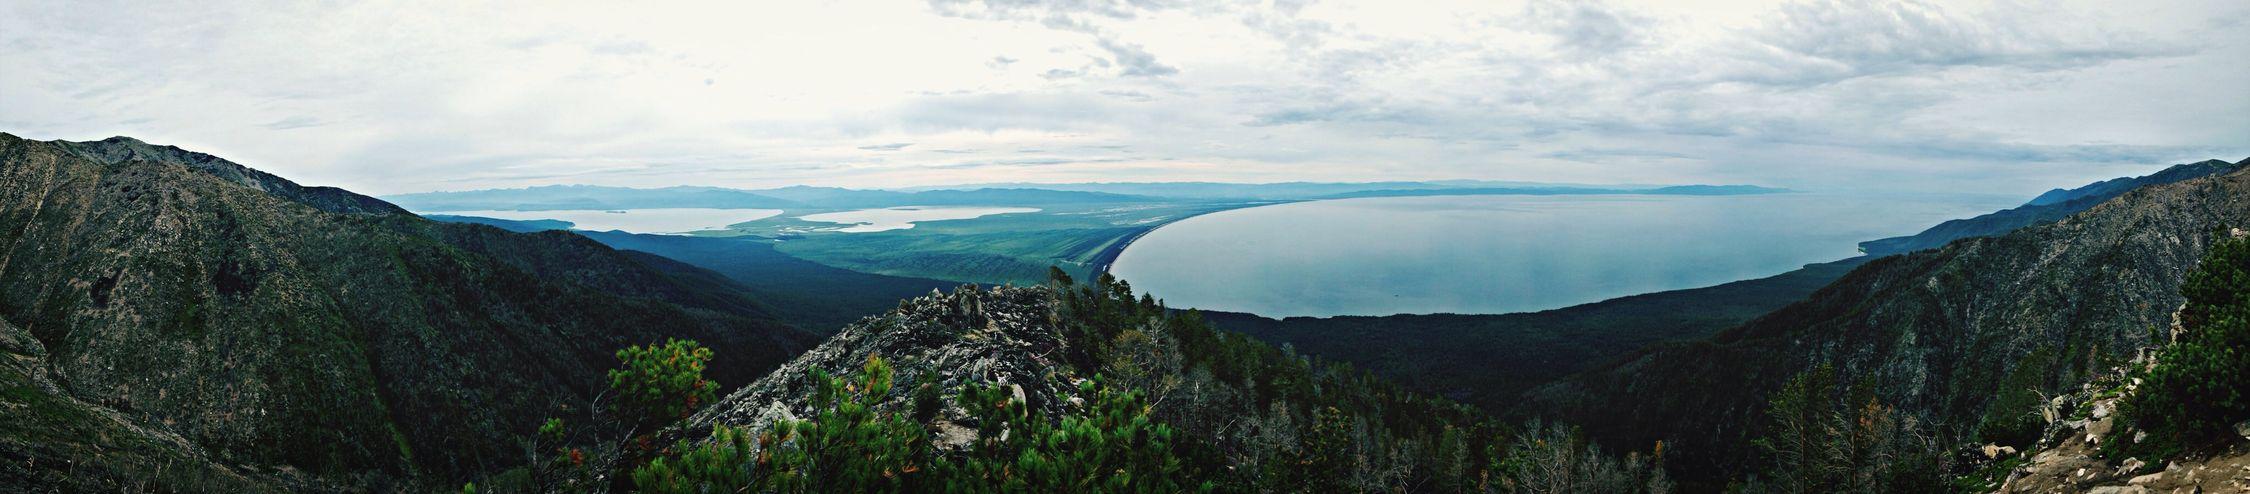 Hello World Enjoying Life Baikal Nature